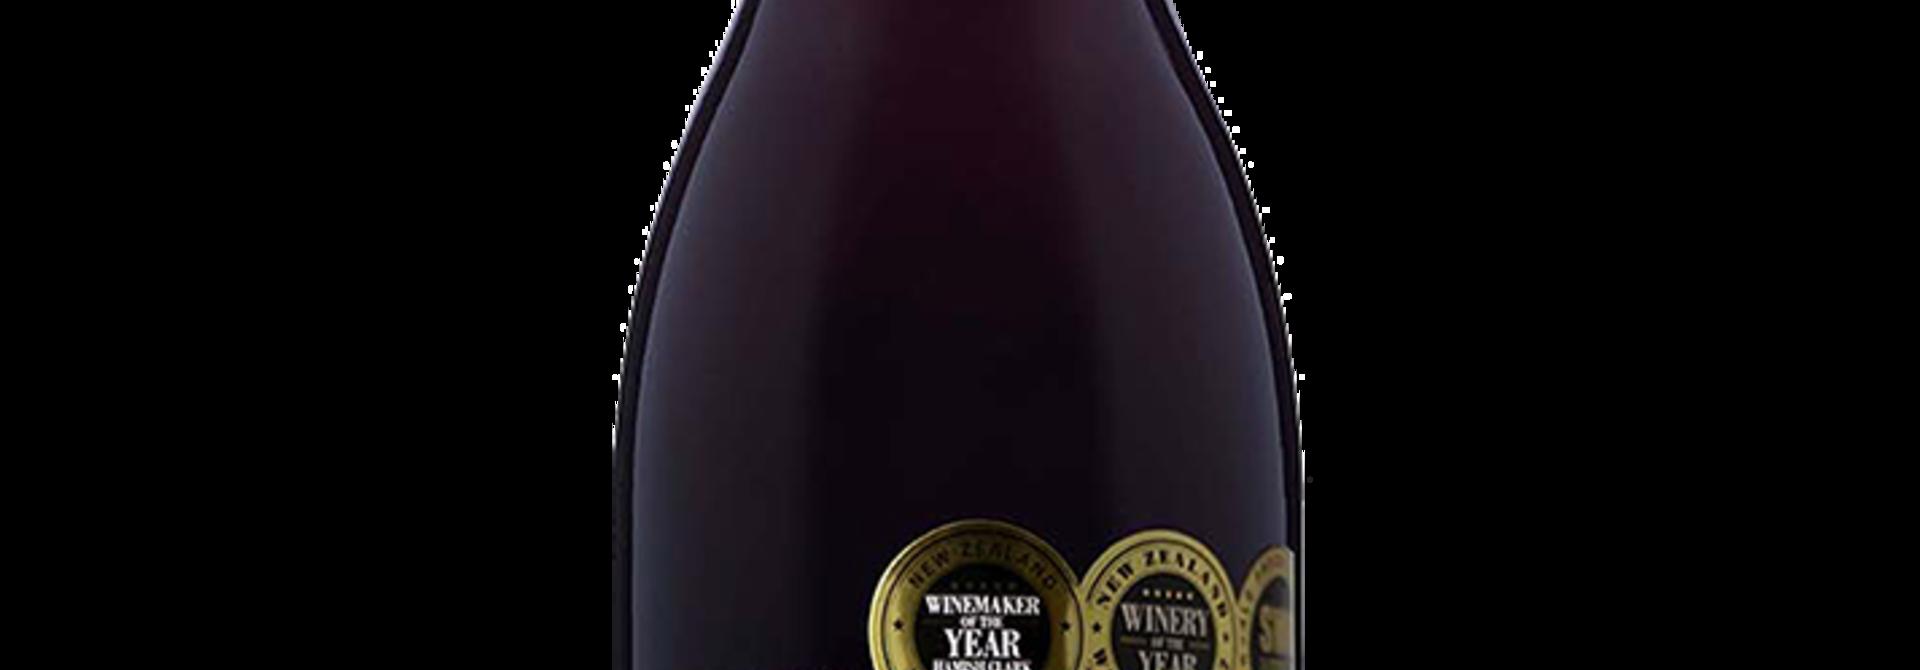 Saint Clair Premium Pinot Noir